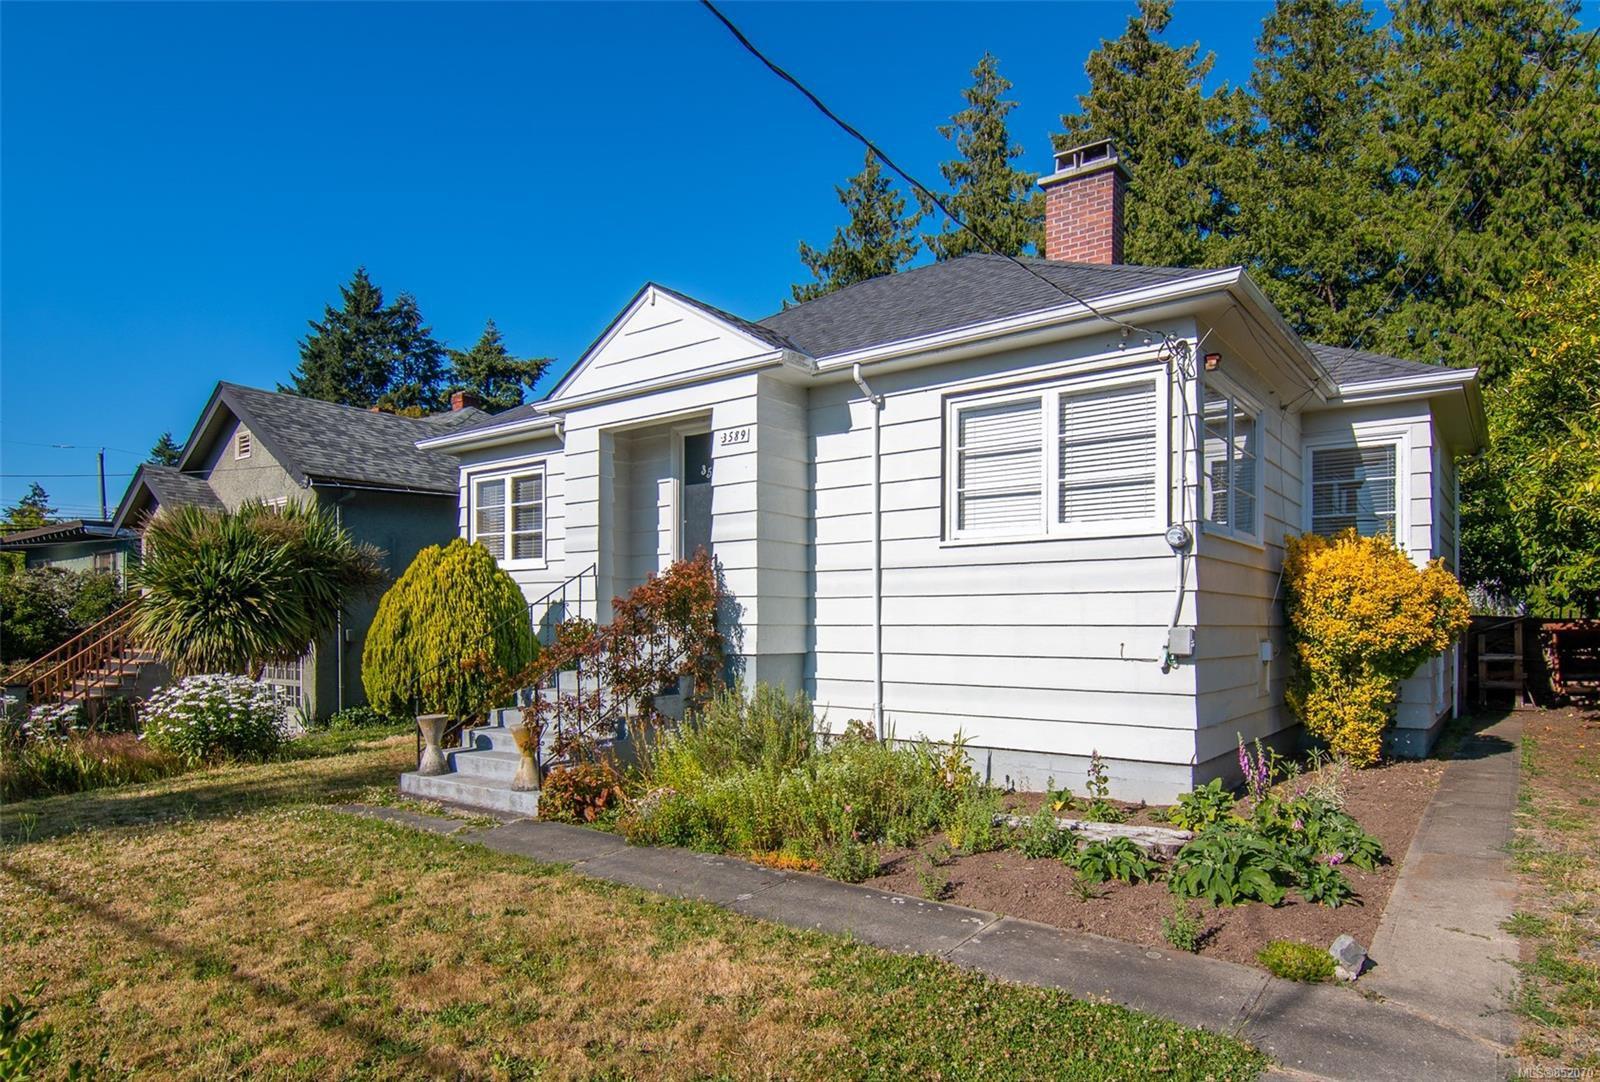 Main Photo: 3589 Savannah Ave in : SE Quadra Single Family Detached for sale (Saanich East)  : MLS®# 852070